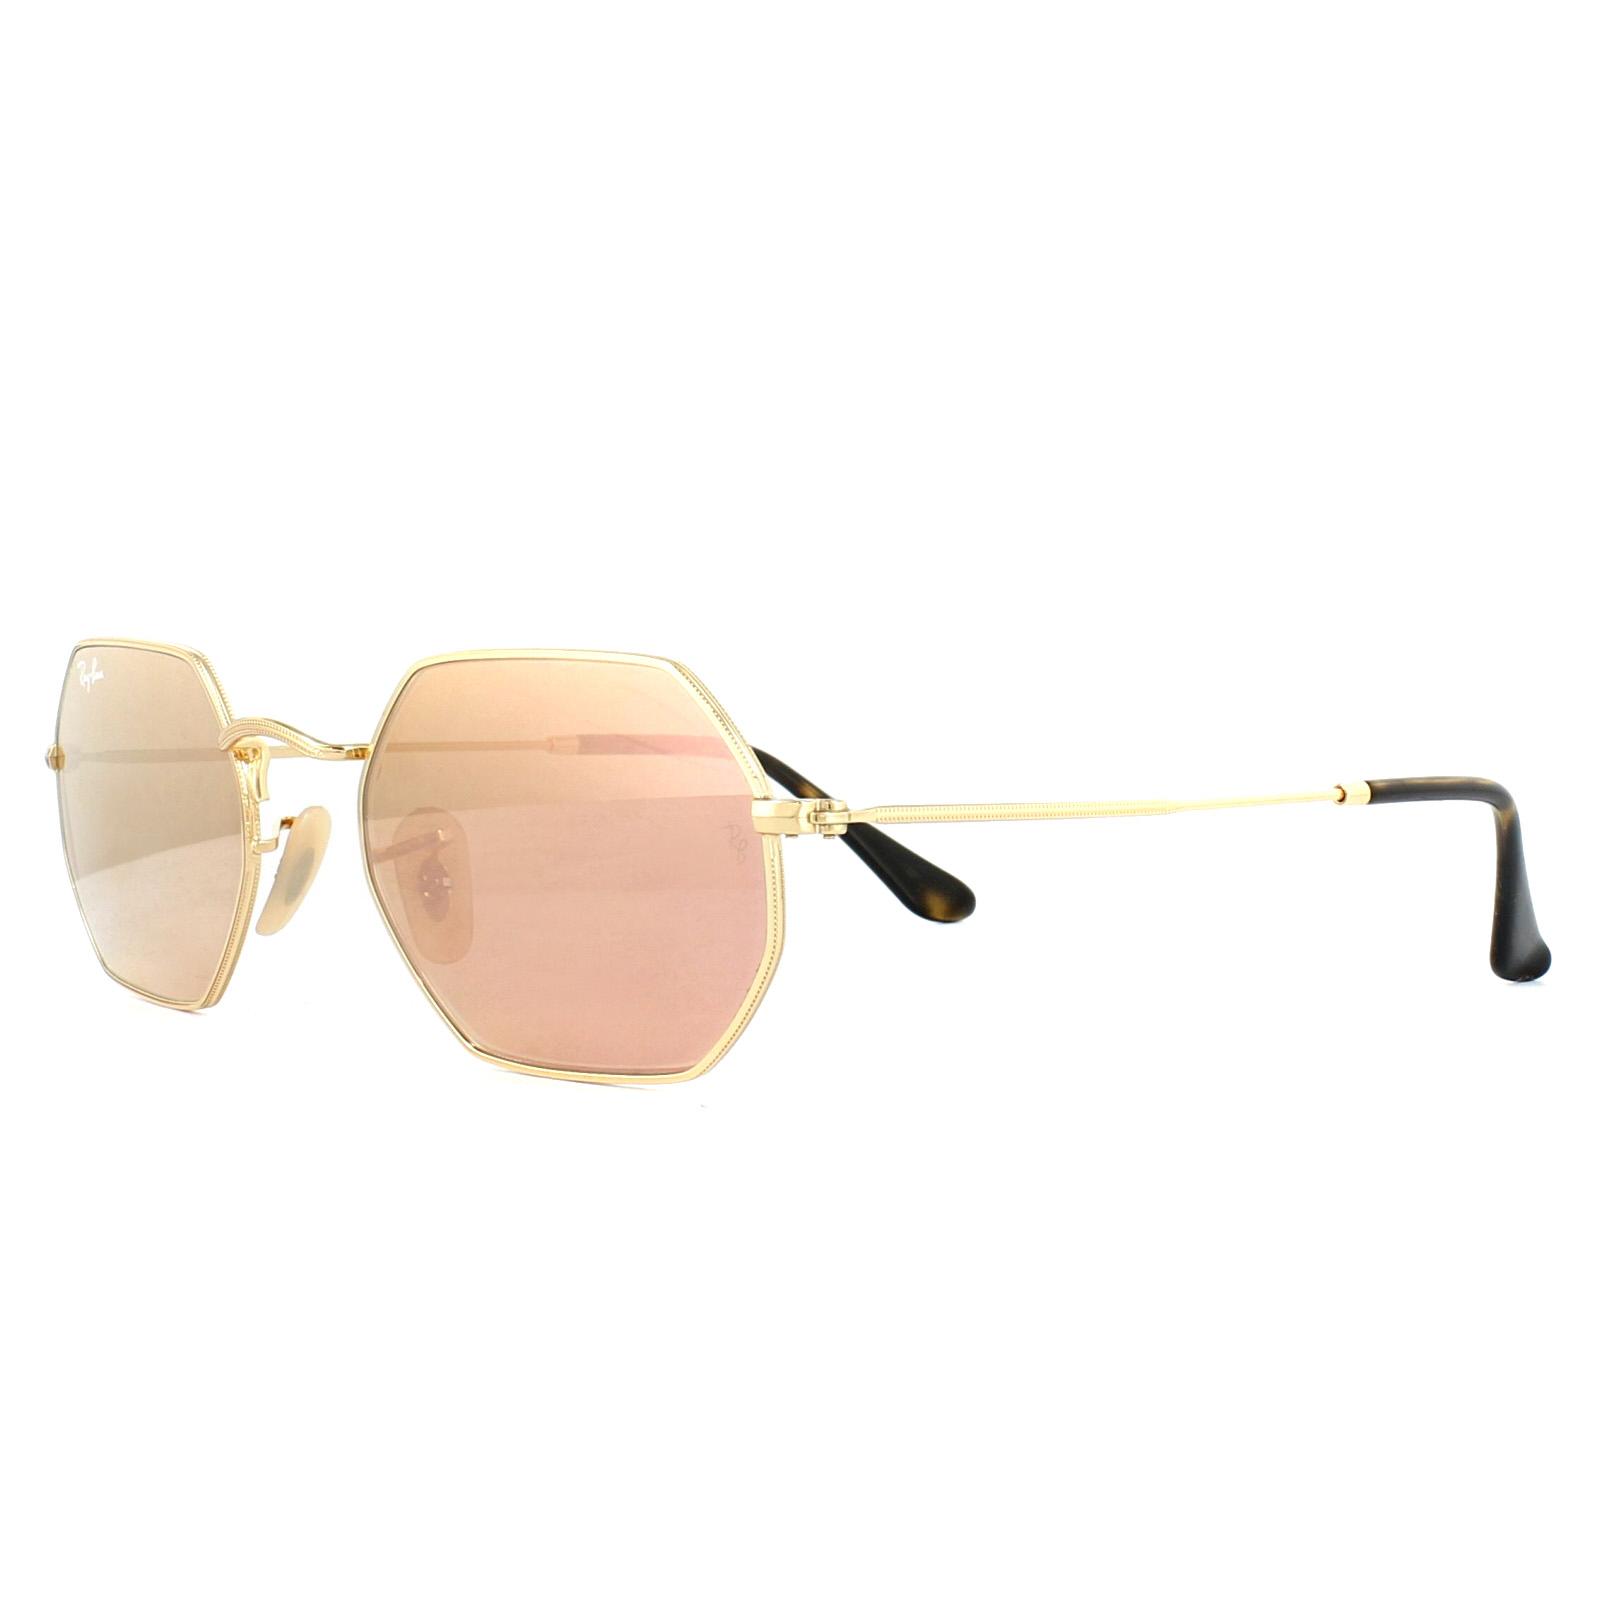 e3d91ad4e3 Cheap Ray-Ban Octagonal 3556N Sunglasses - Discounted Sunglasses